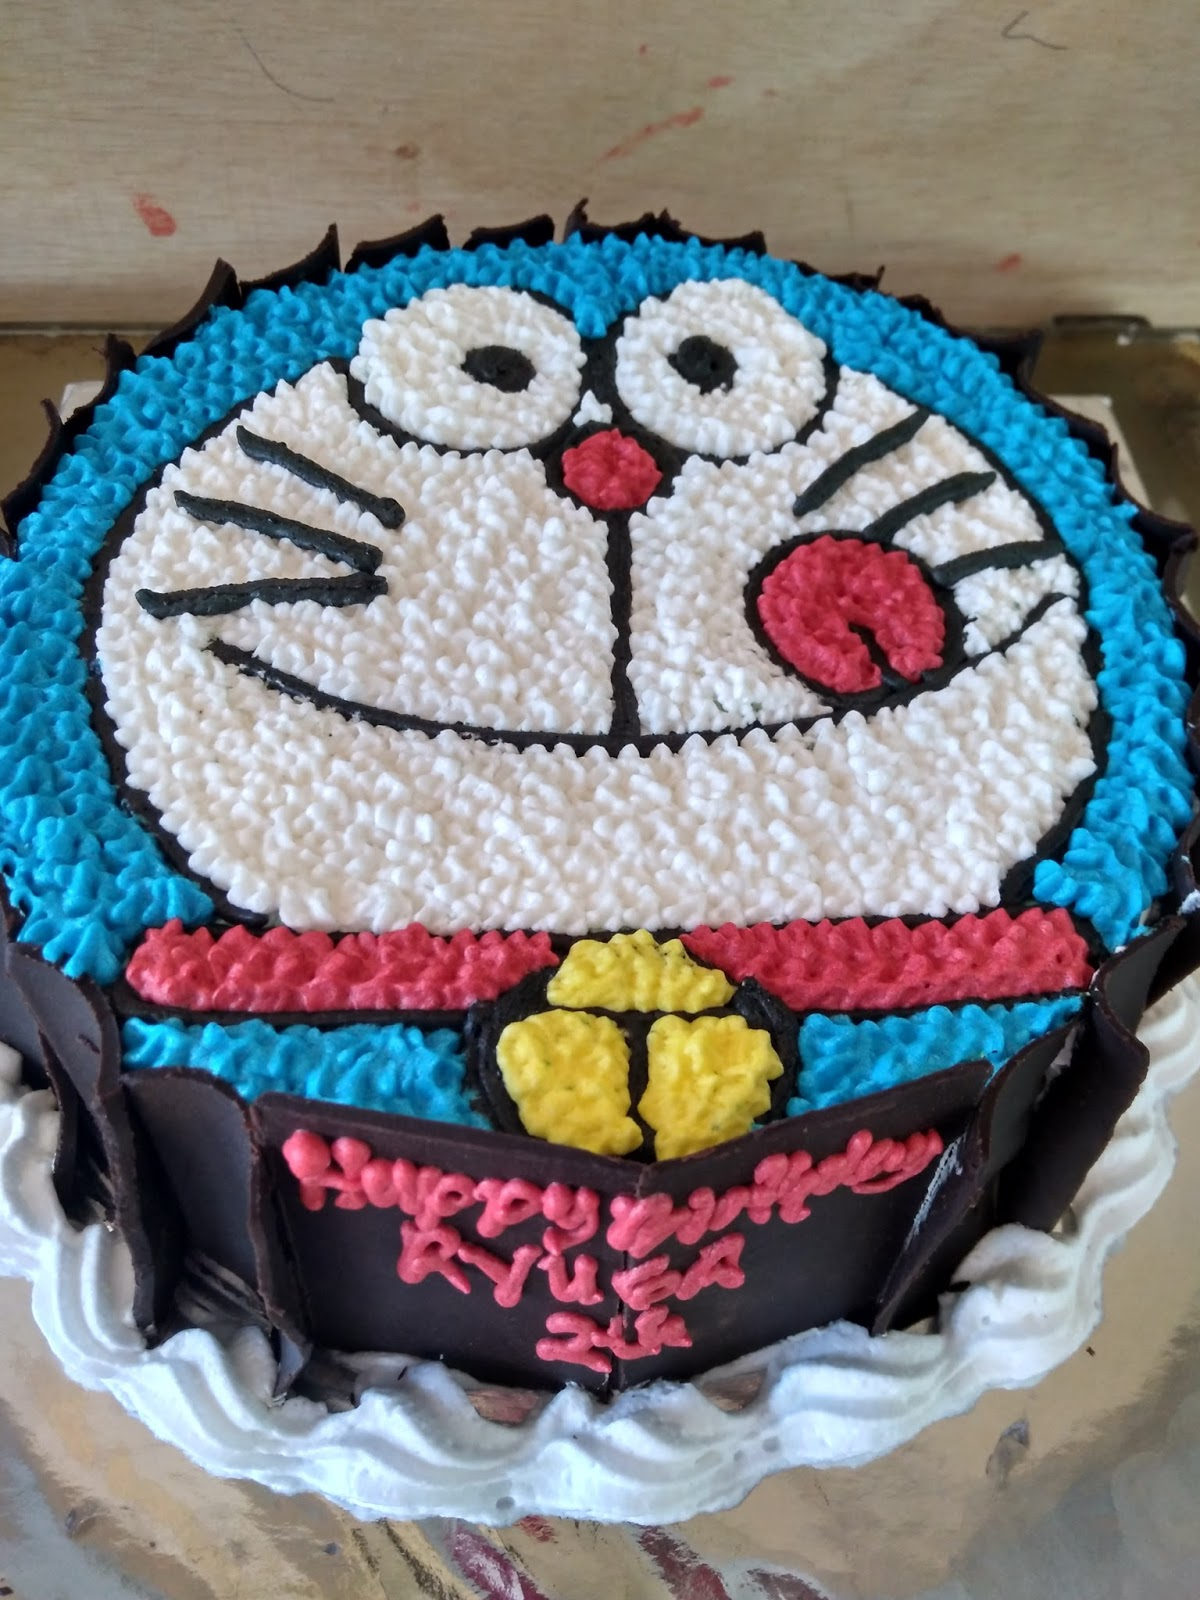 0877 3902 1229 Xl Tart Karakter Almond Bakery Cafe